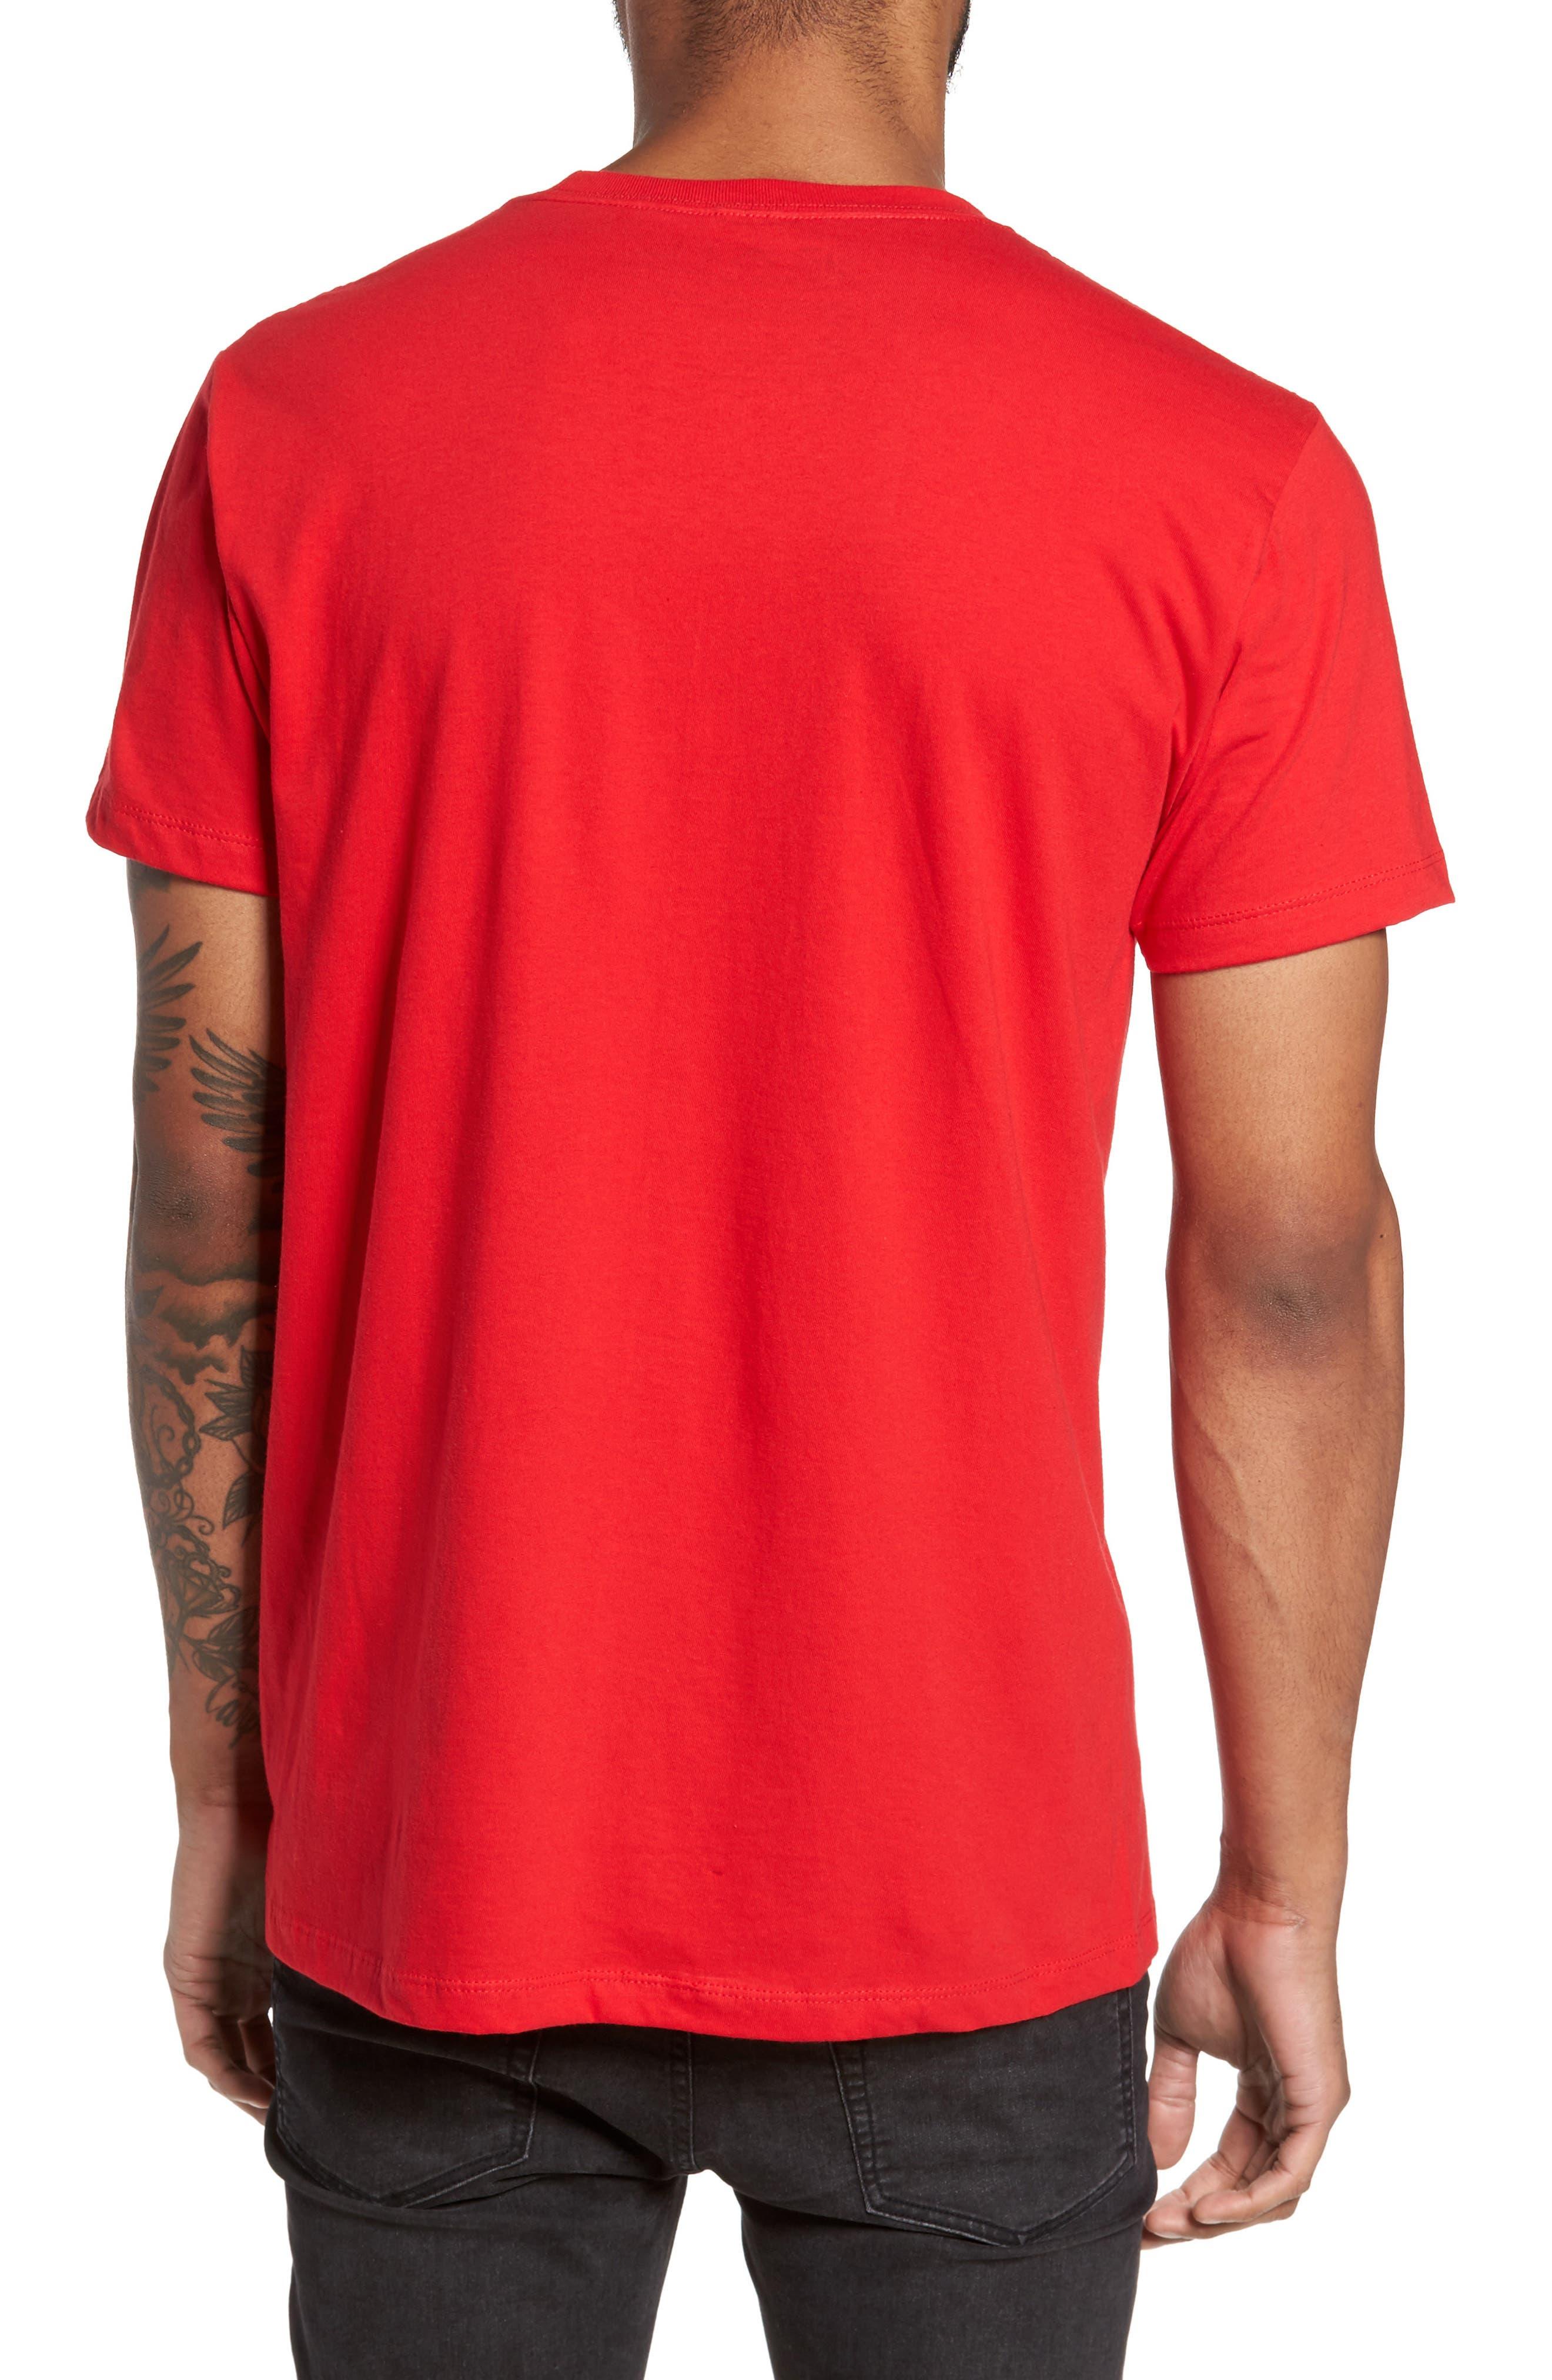 Stay Woke T-Shirt,                             Alternate thumbnail 2, color,                             Red Stay Woke